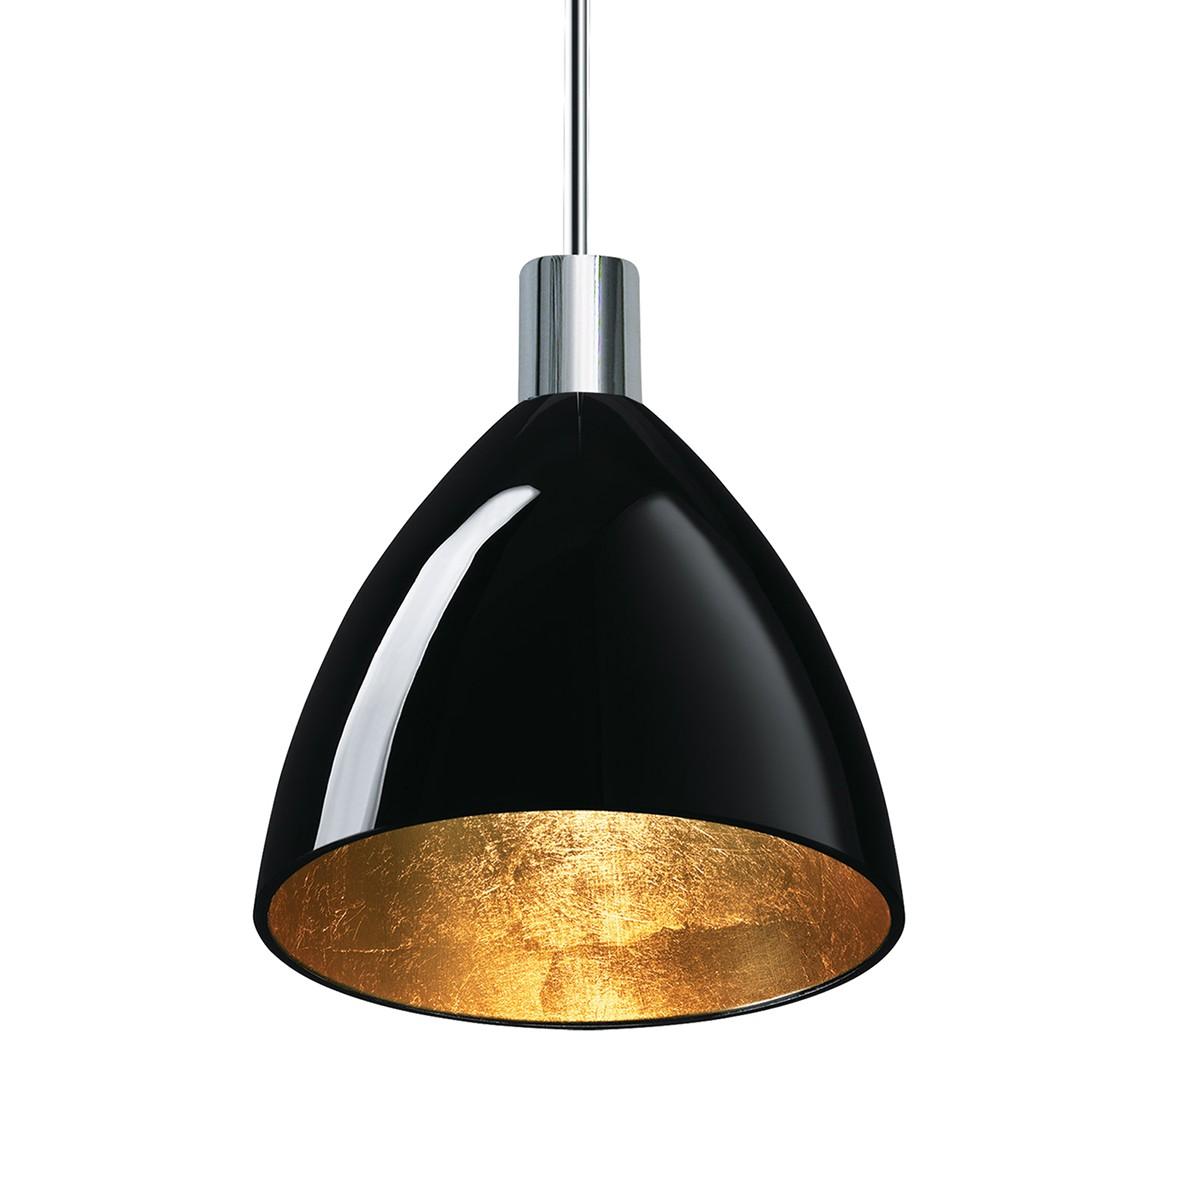 Bruck Duolare Silva Neo Ø: 16 cm Fassung: Chrom LED Pendelleuchte, Glas: schwarz - Gold